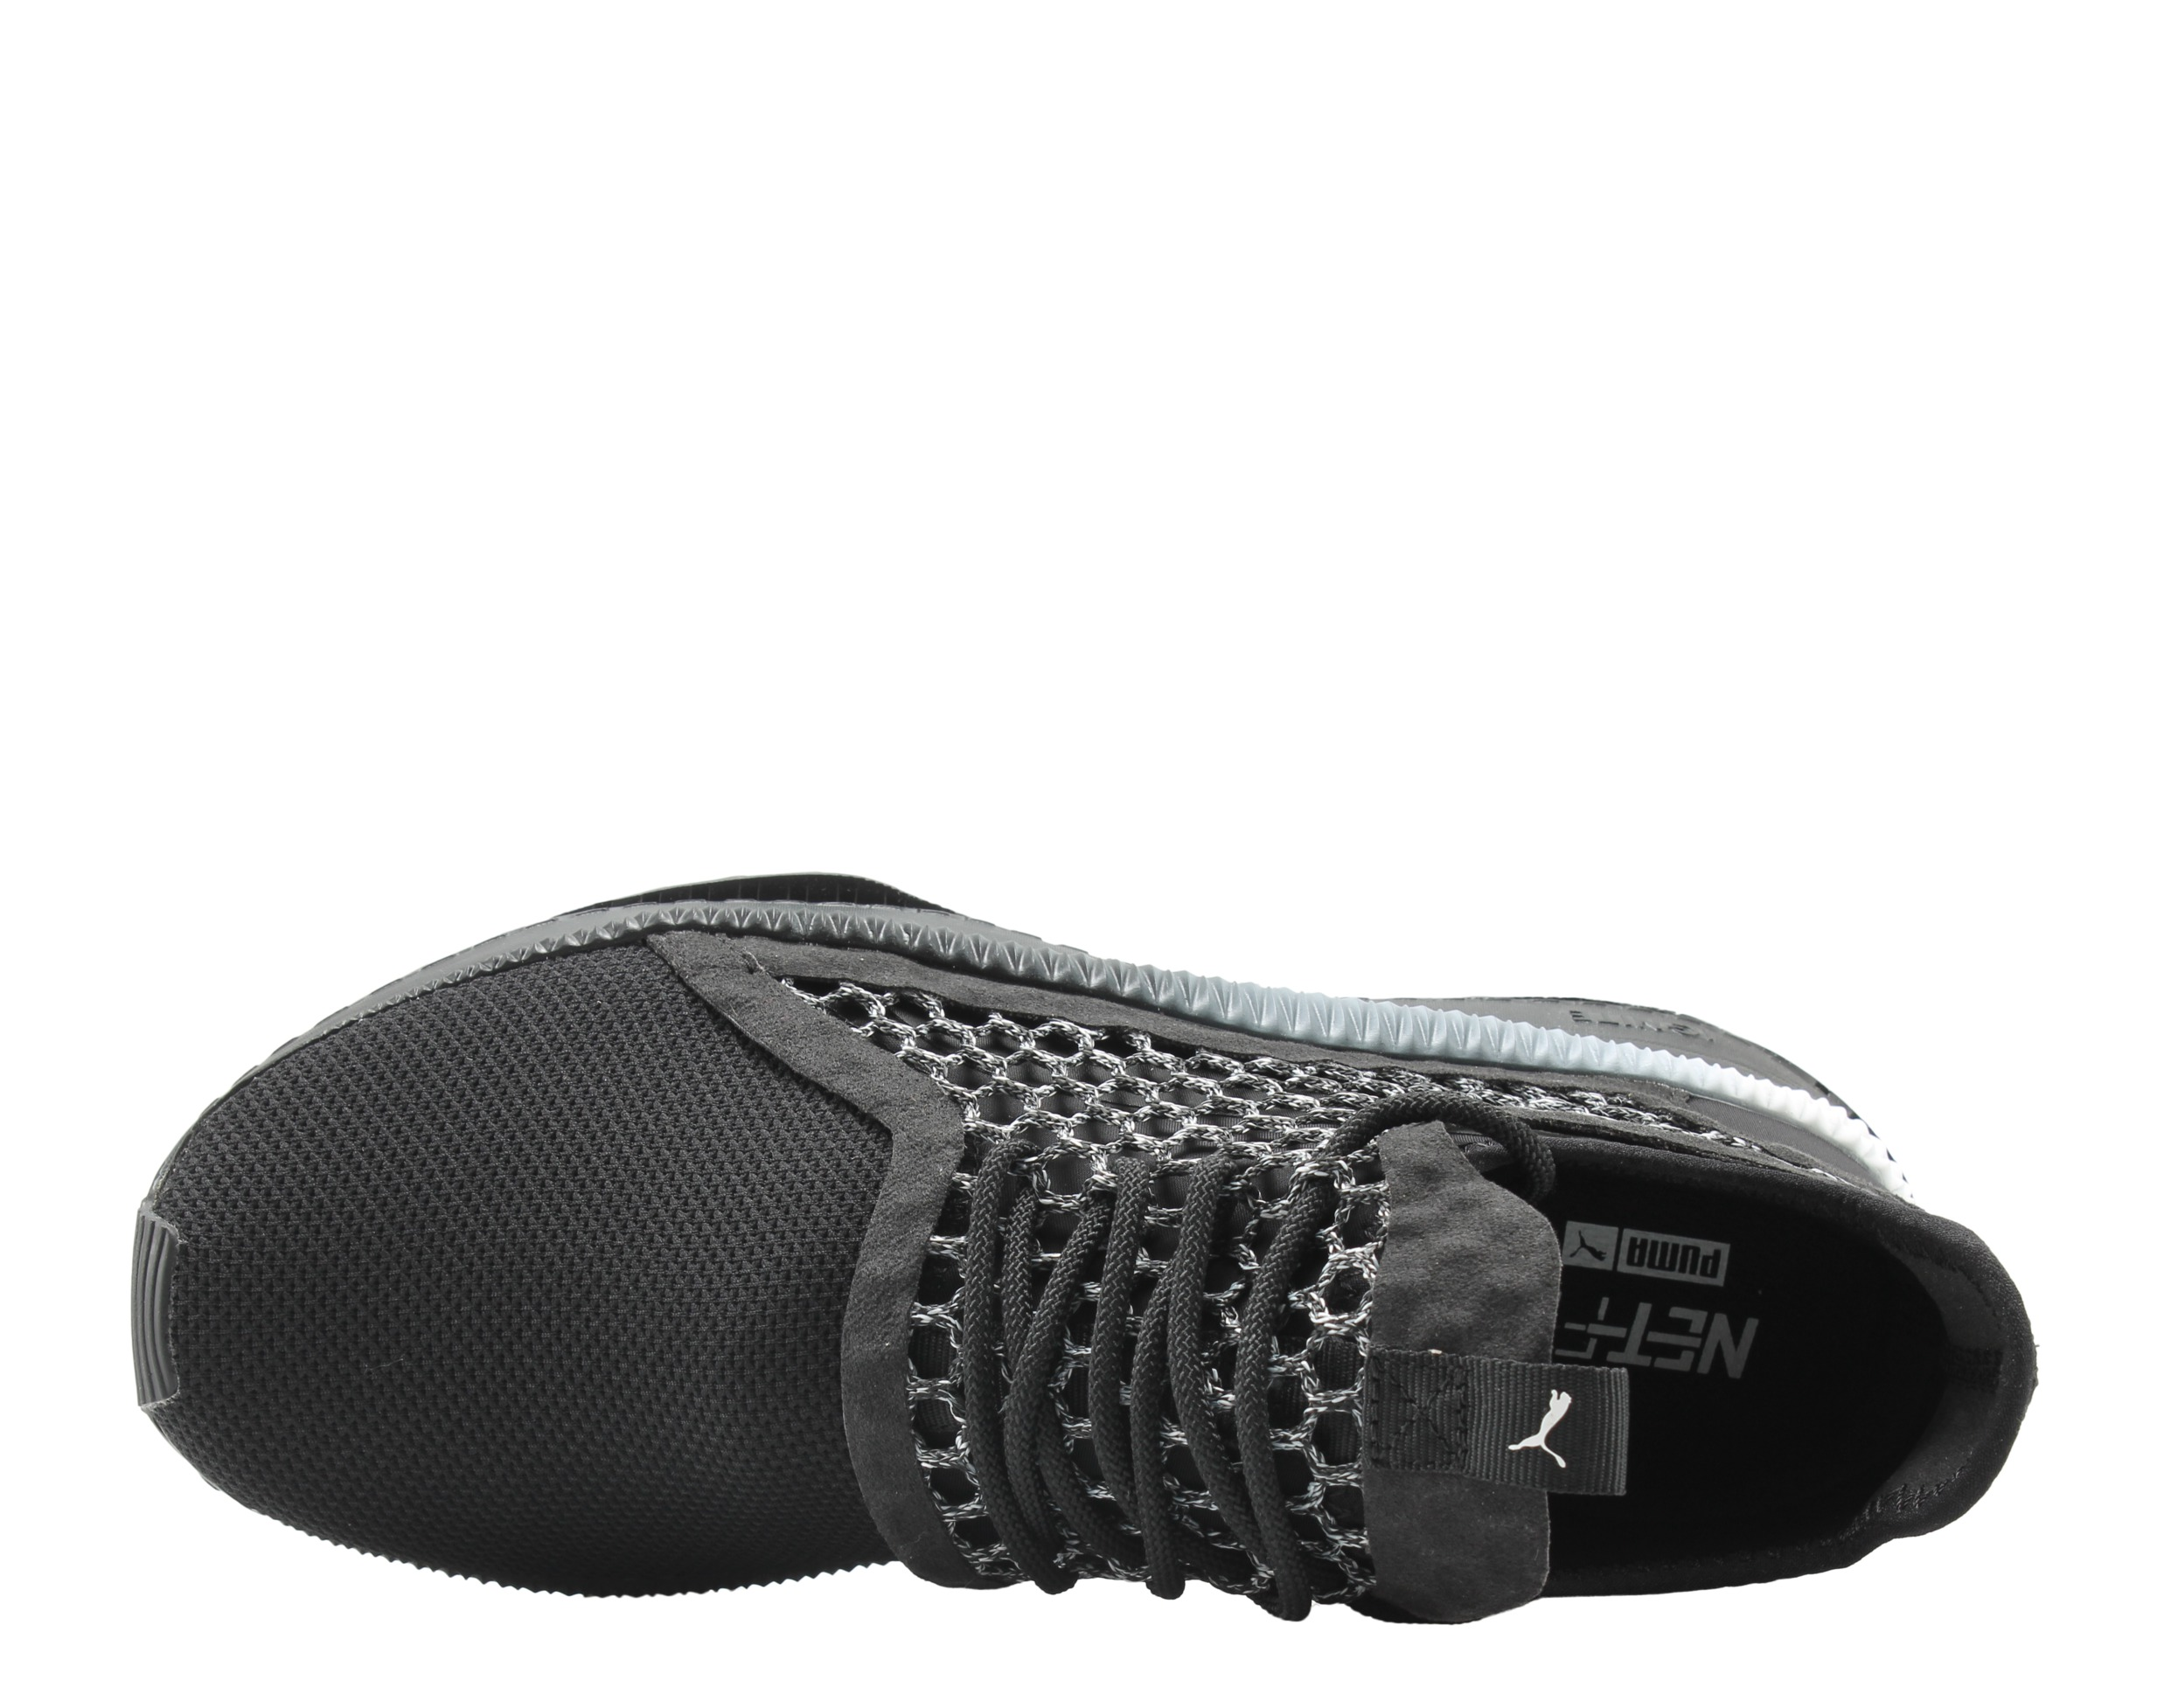 04f0811d762dcd PUMA - Puma Tsugi Netfit V2 Black-White-Black Men s Running Shoes 36539802  - Walmart.com